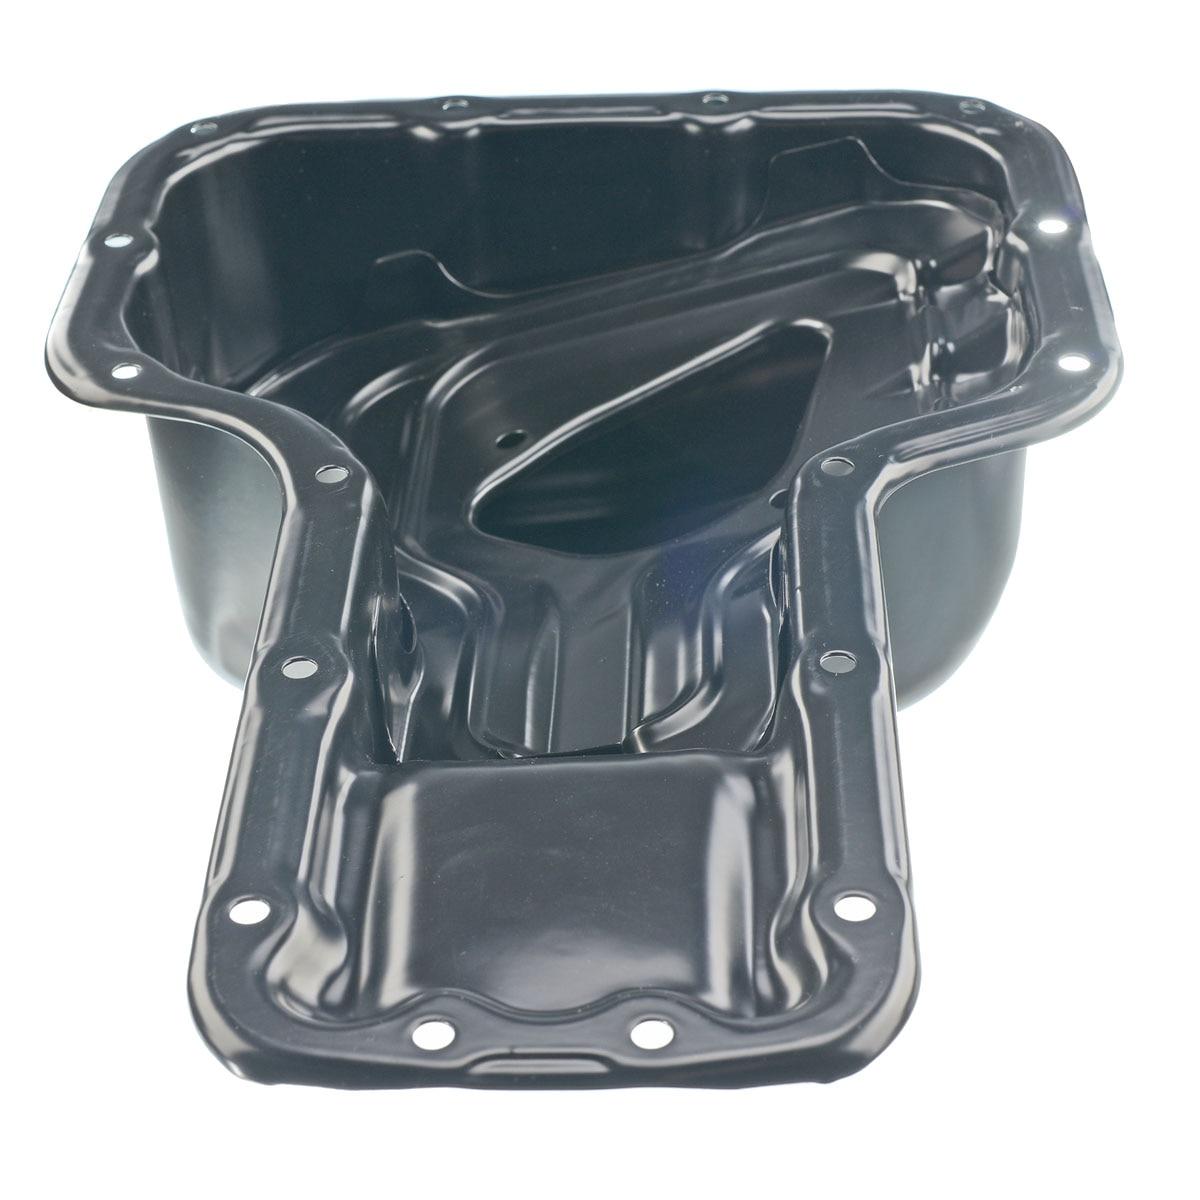 Pans & Drain Plugs A-Premium Transmission Oil Pan for Toyota ...